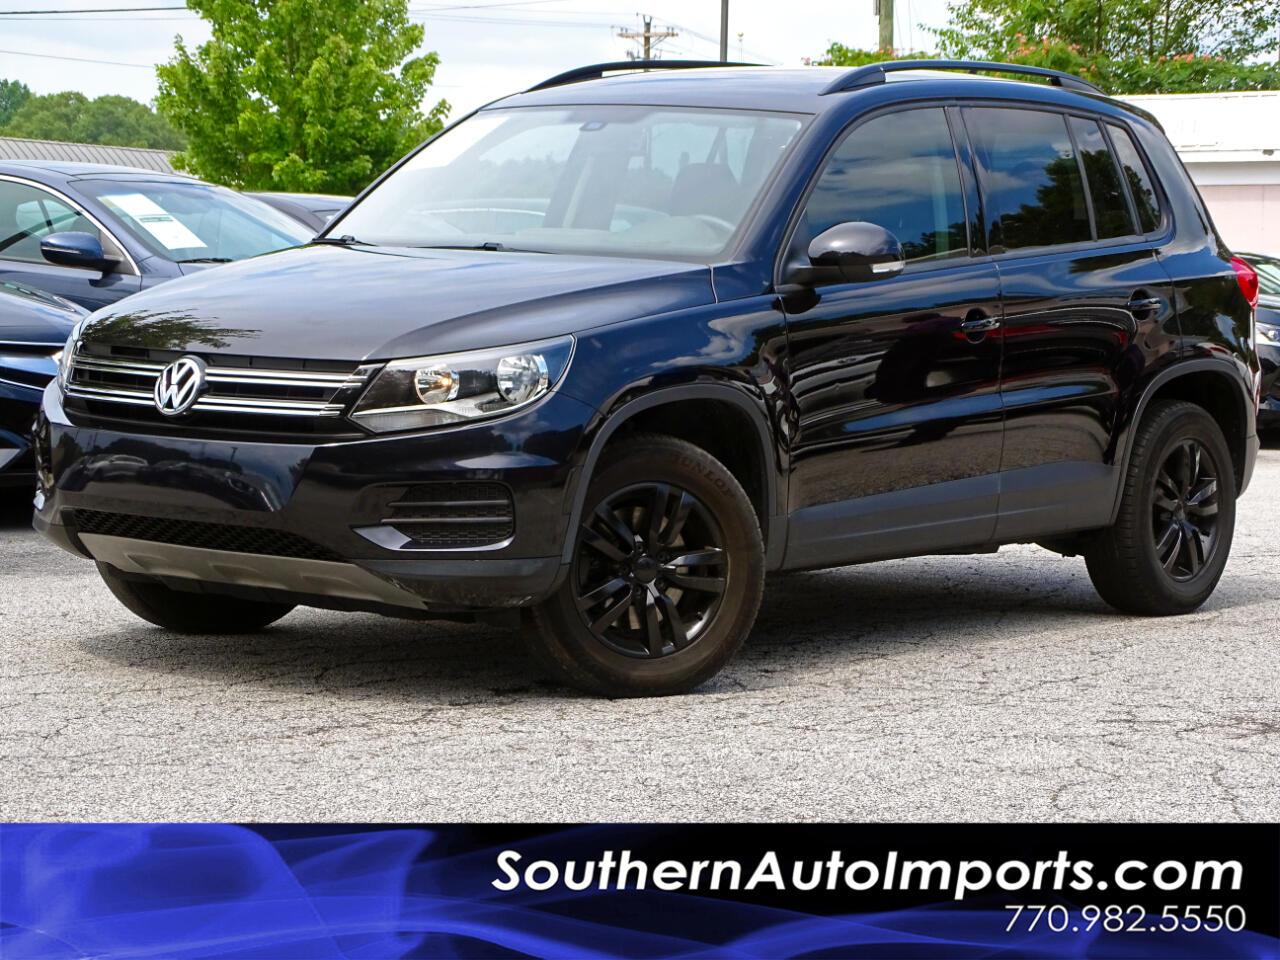 2017 Volkswagen Tiguan 2.0T S Back up Camera Bluetooth Heated Seats